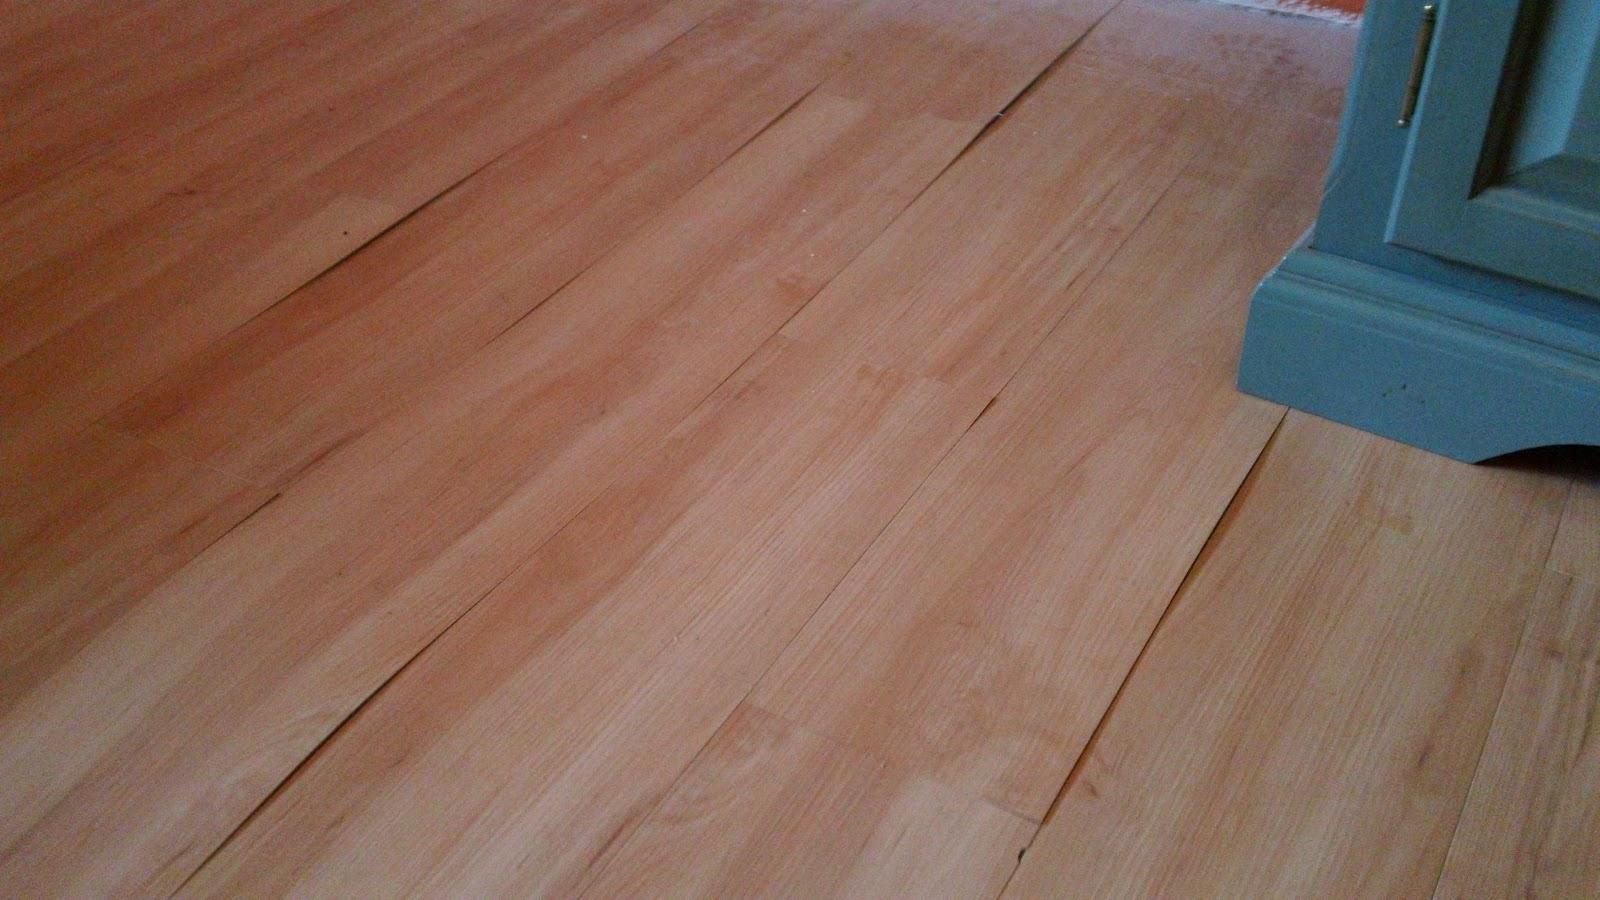 Laminate flooring water leak under laminate flooring for Laminate flooring to carpet